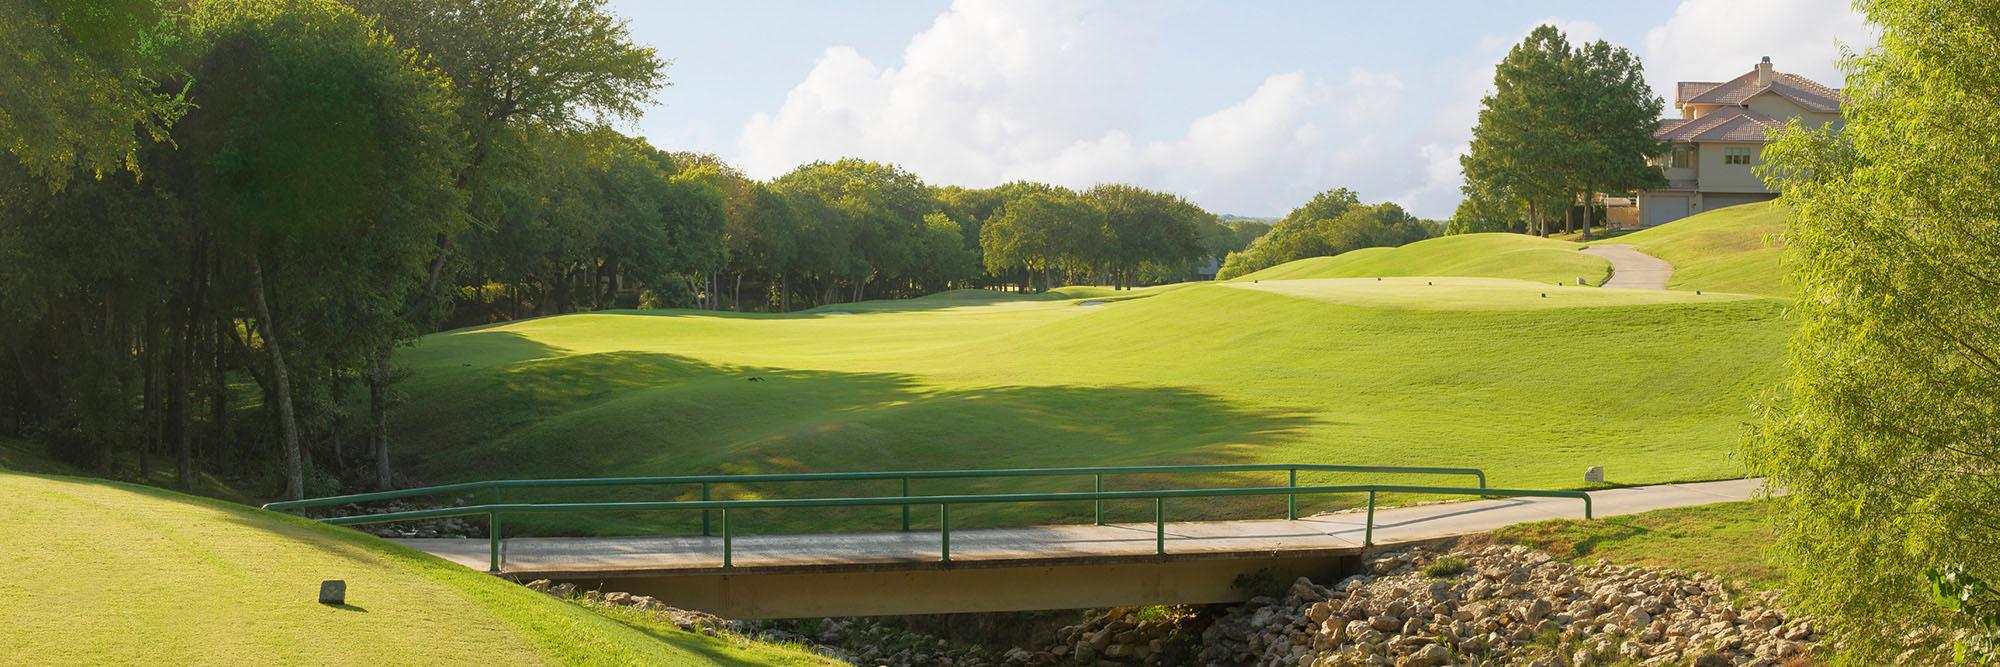 Golf Course Image - Mira Vista No. 15